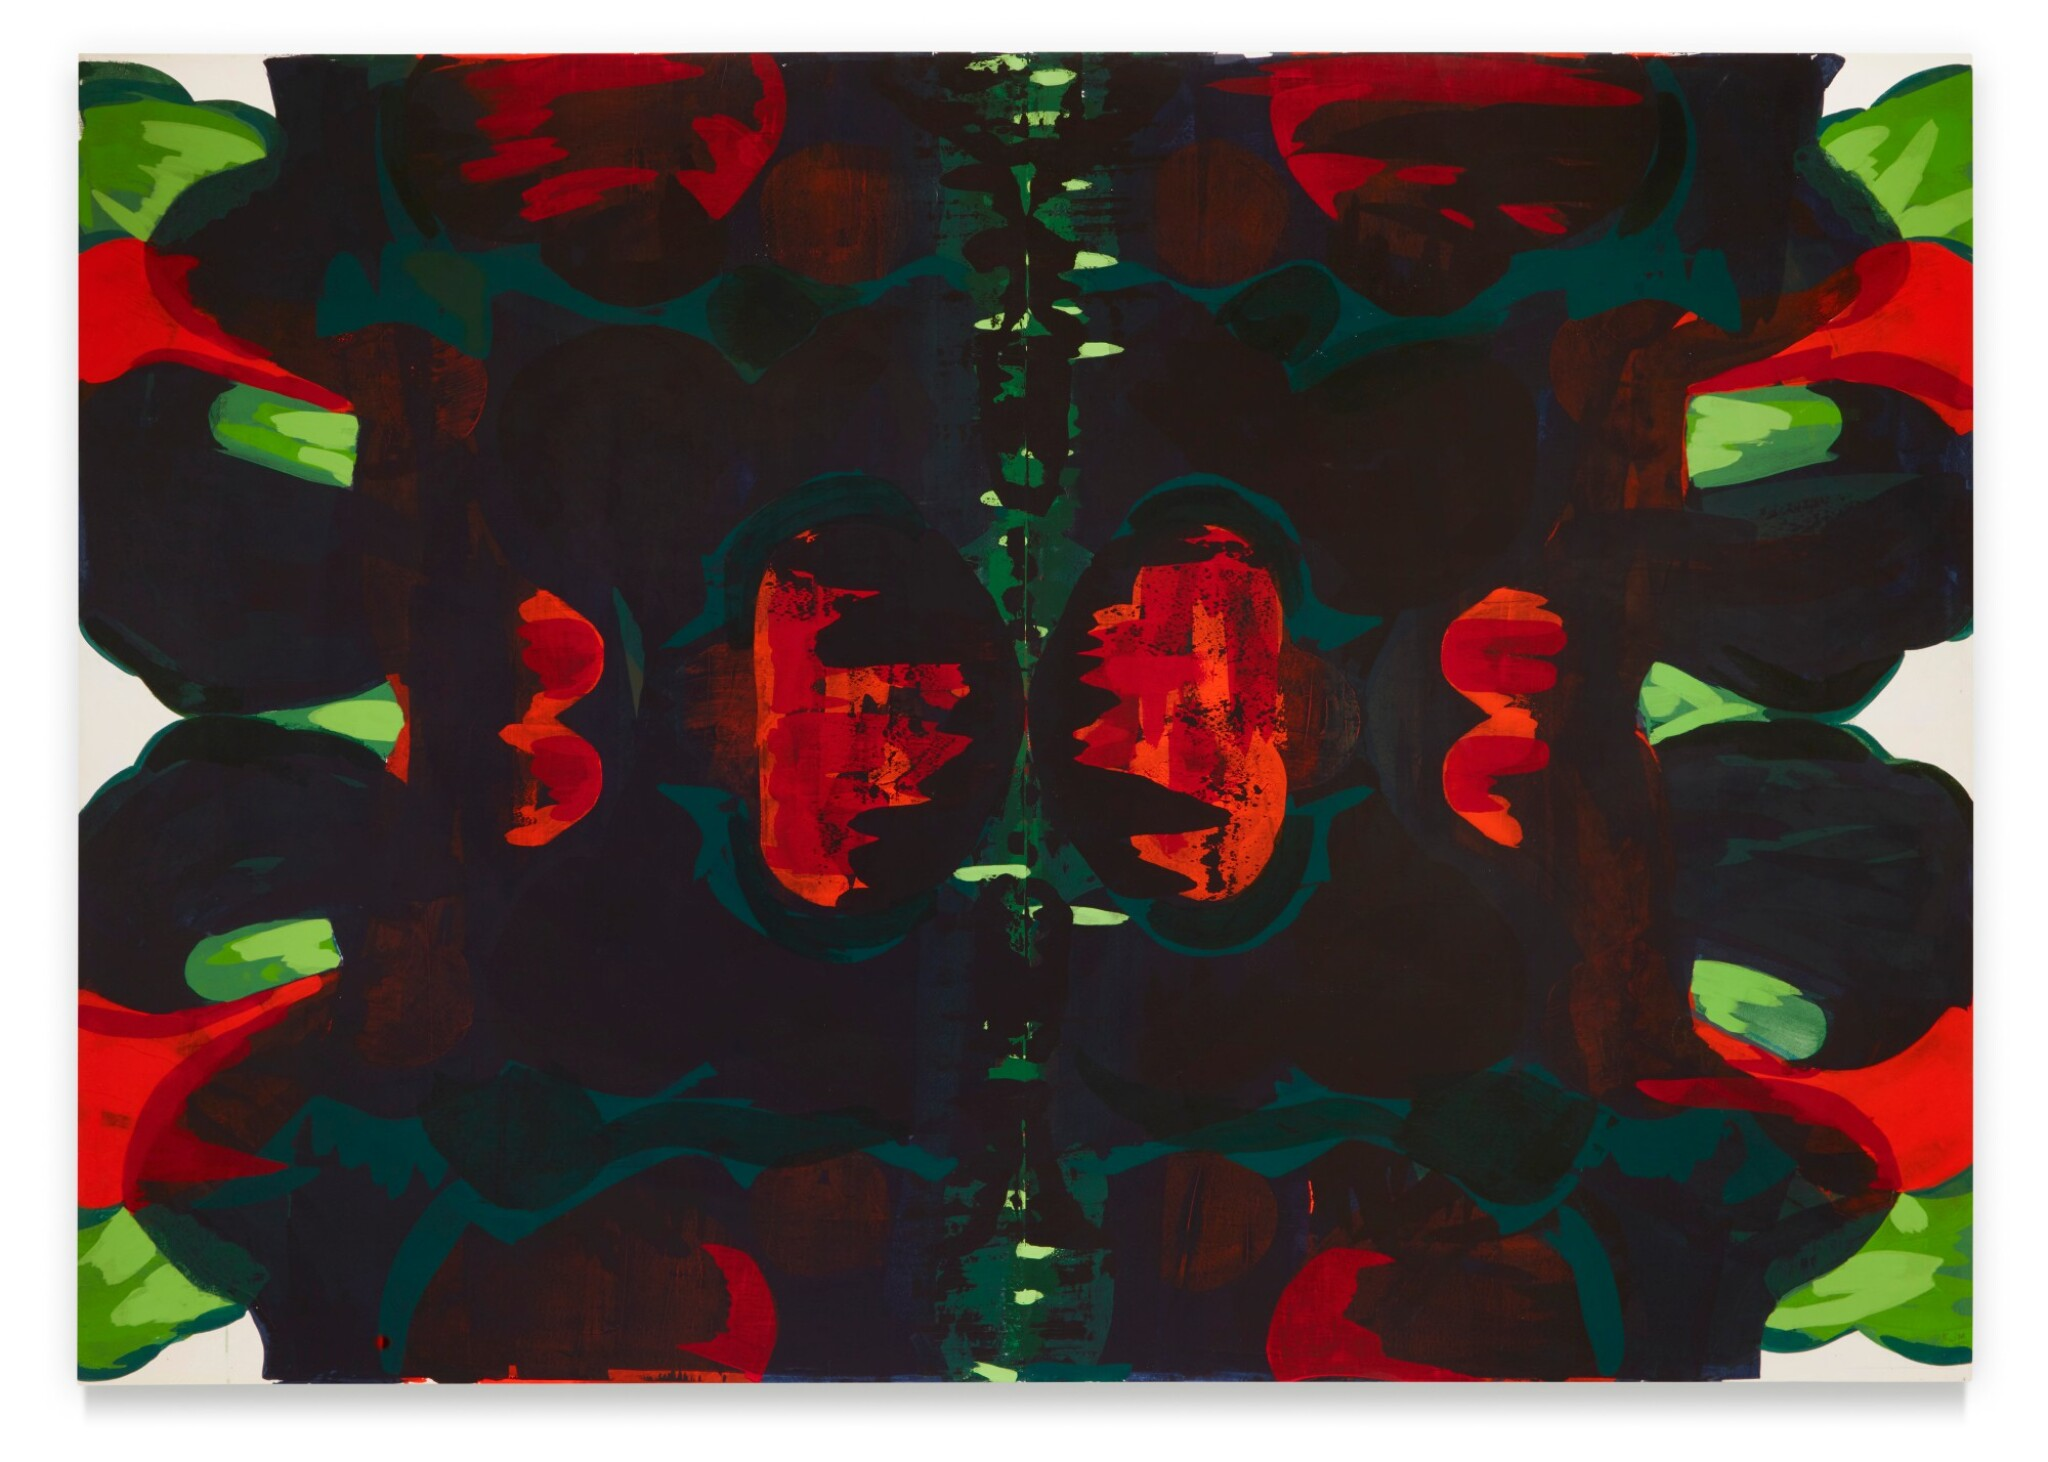 KERRY JAMES MARSHALL | UNTITLED (BLOT)